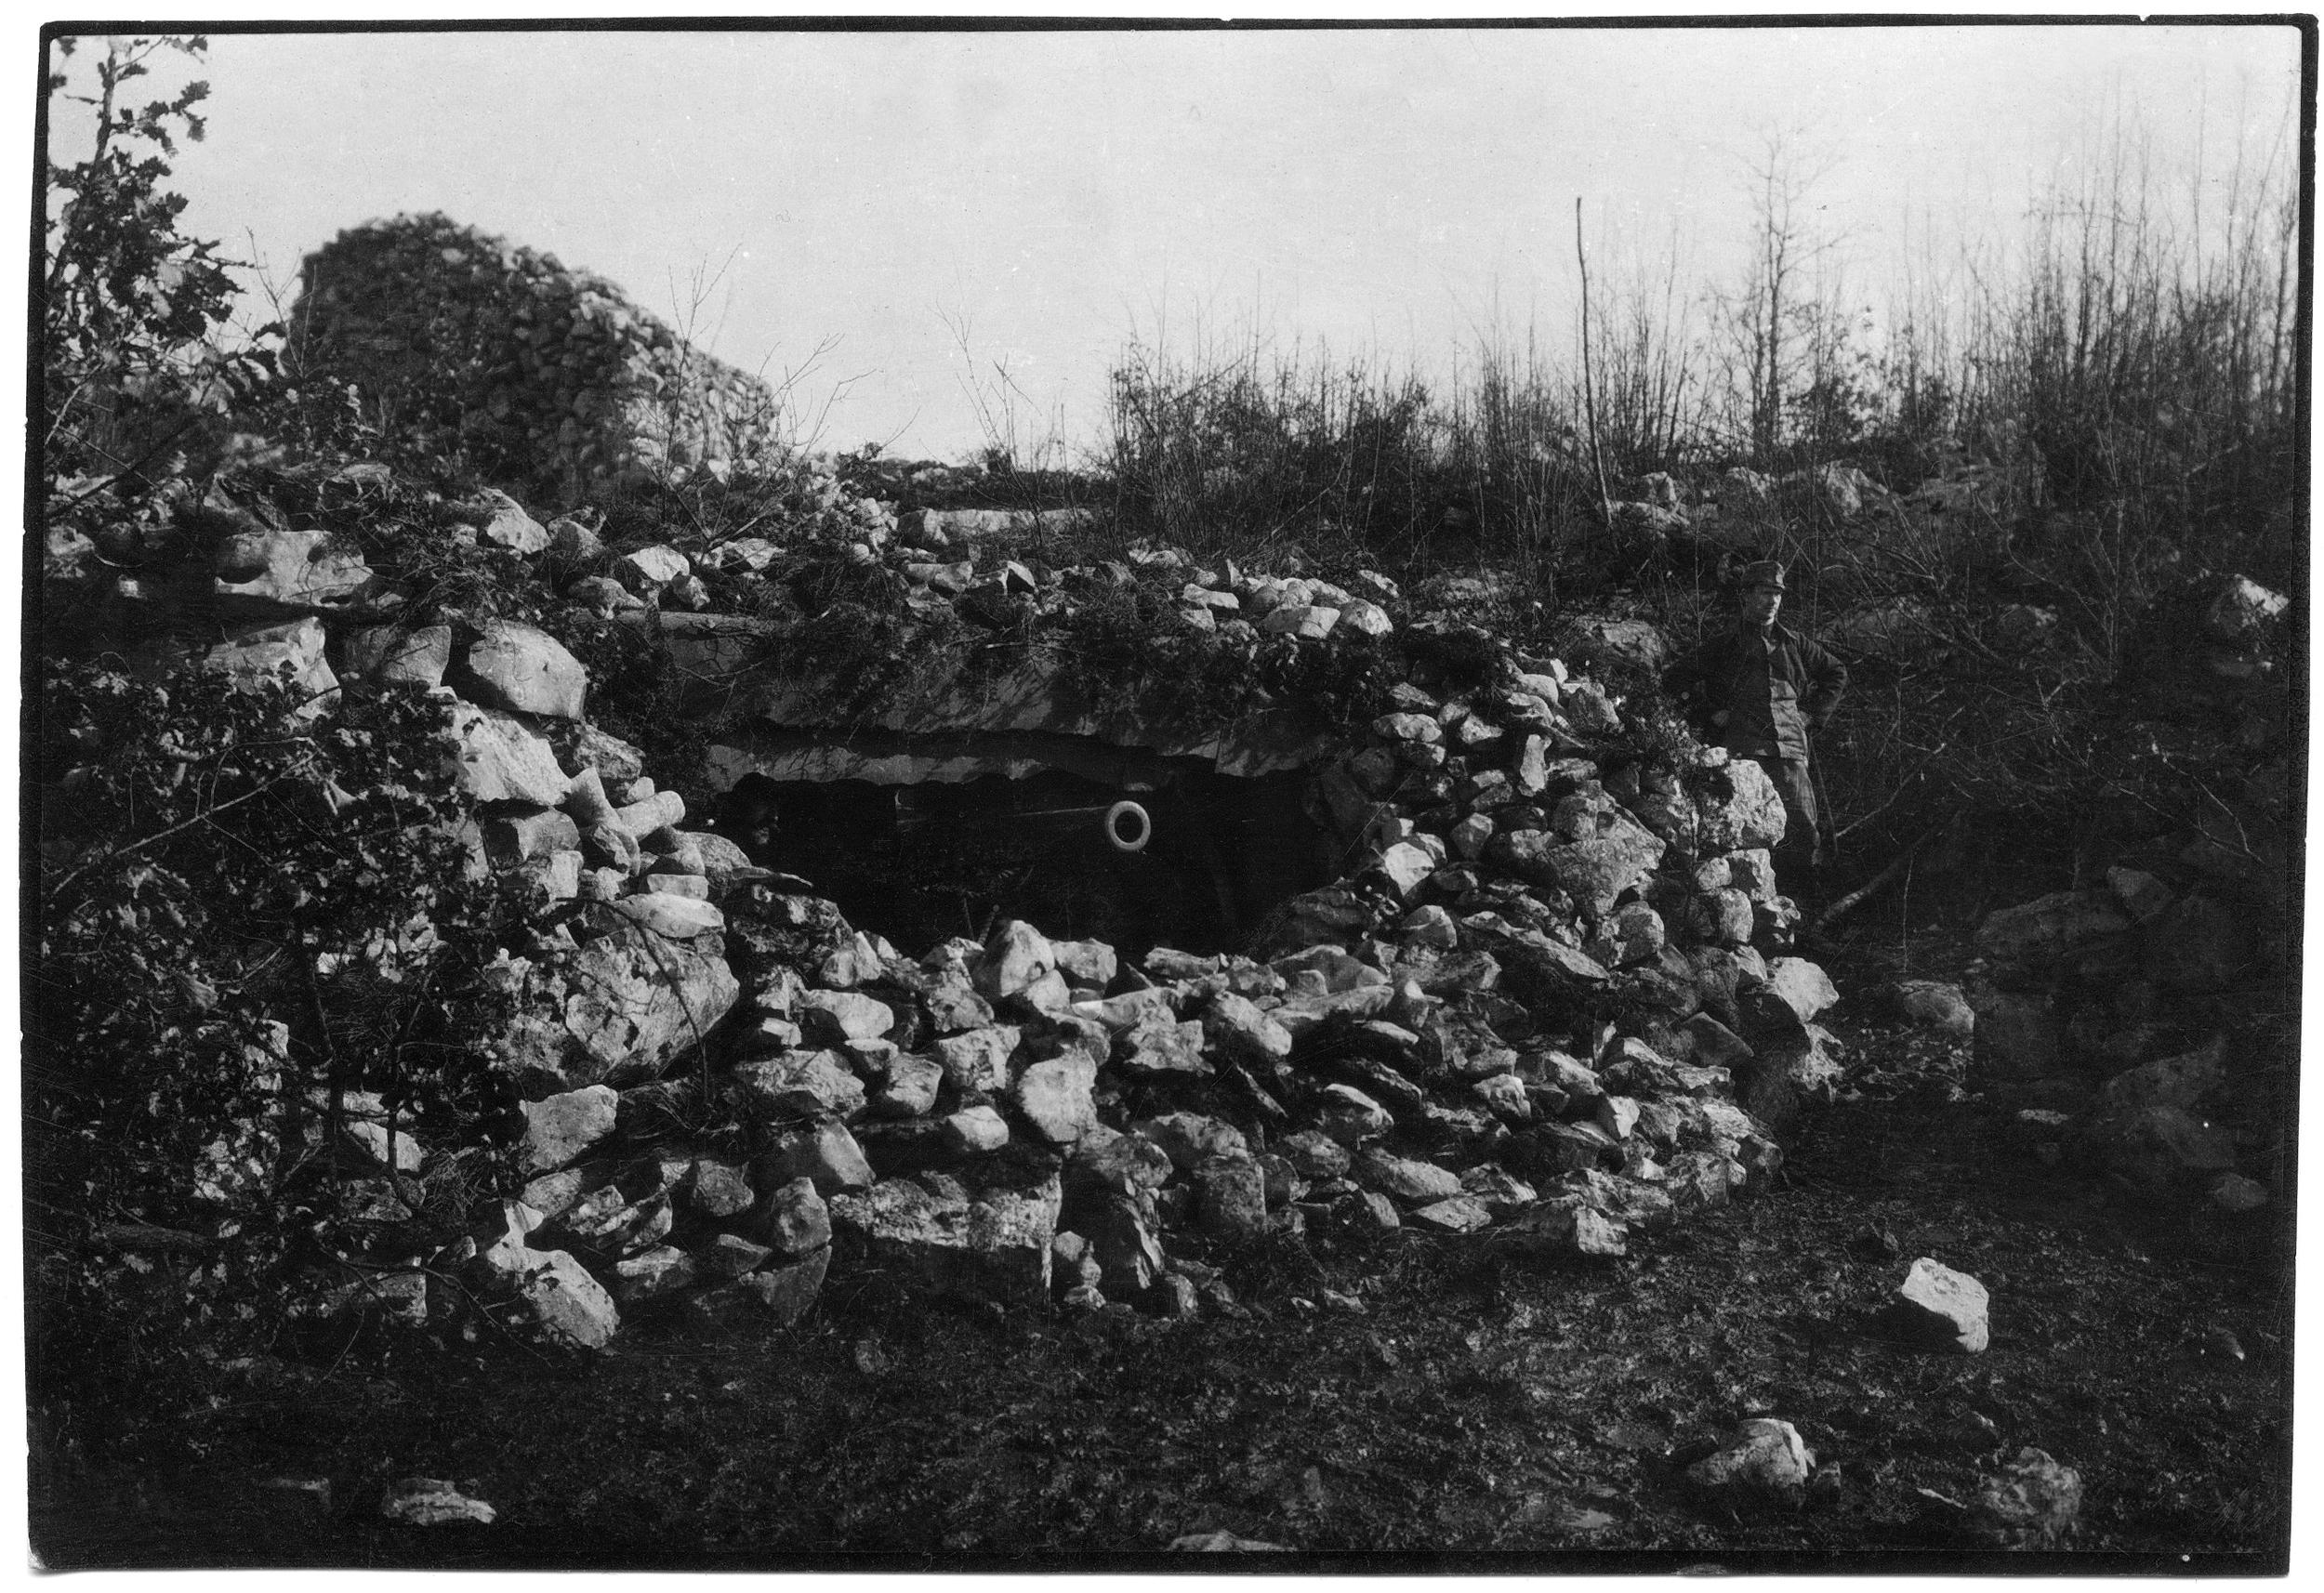 96 - pezzo d'artiglieria.JPG